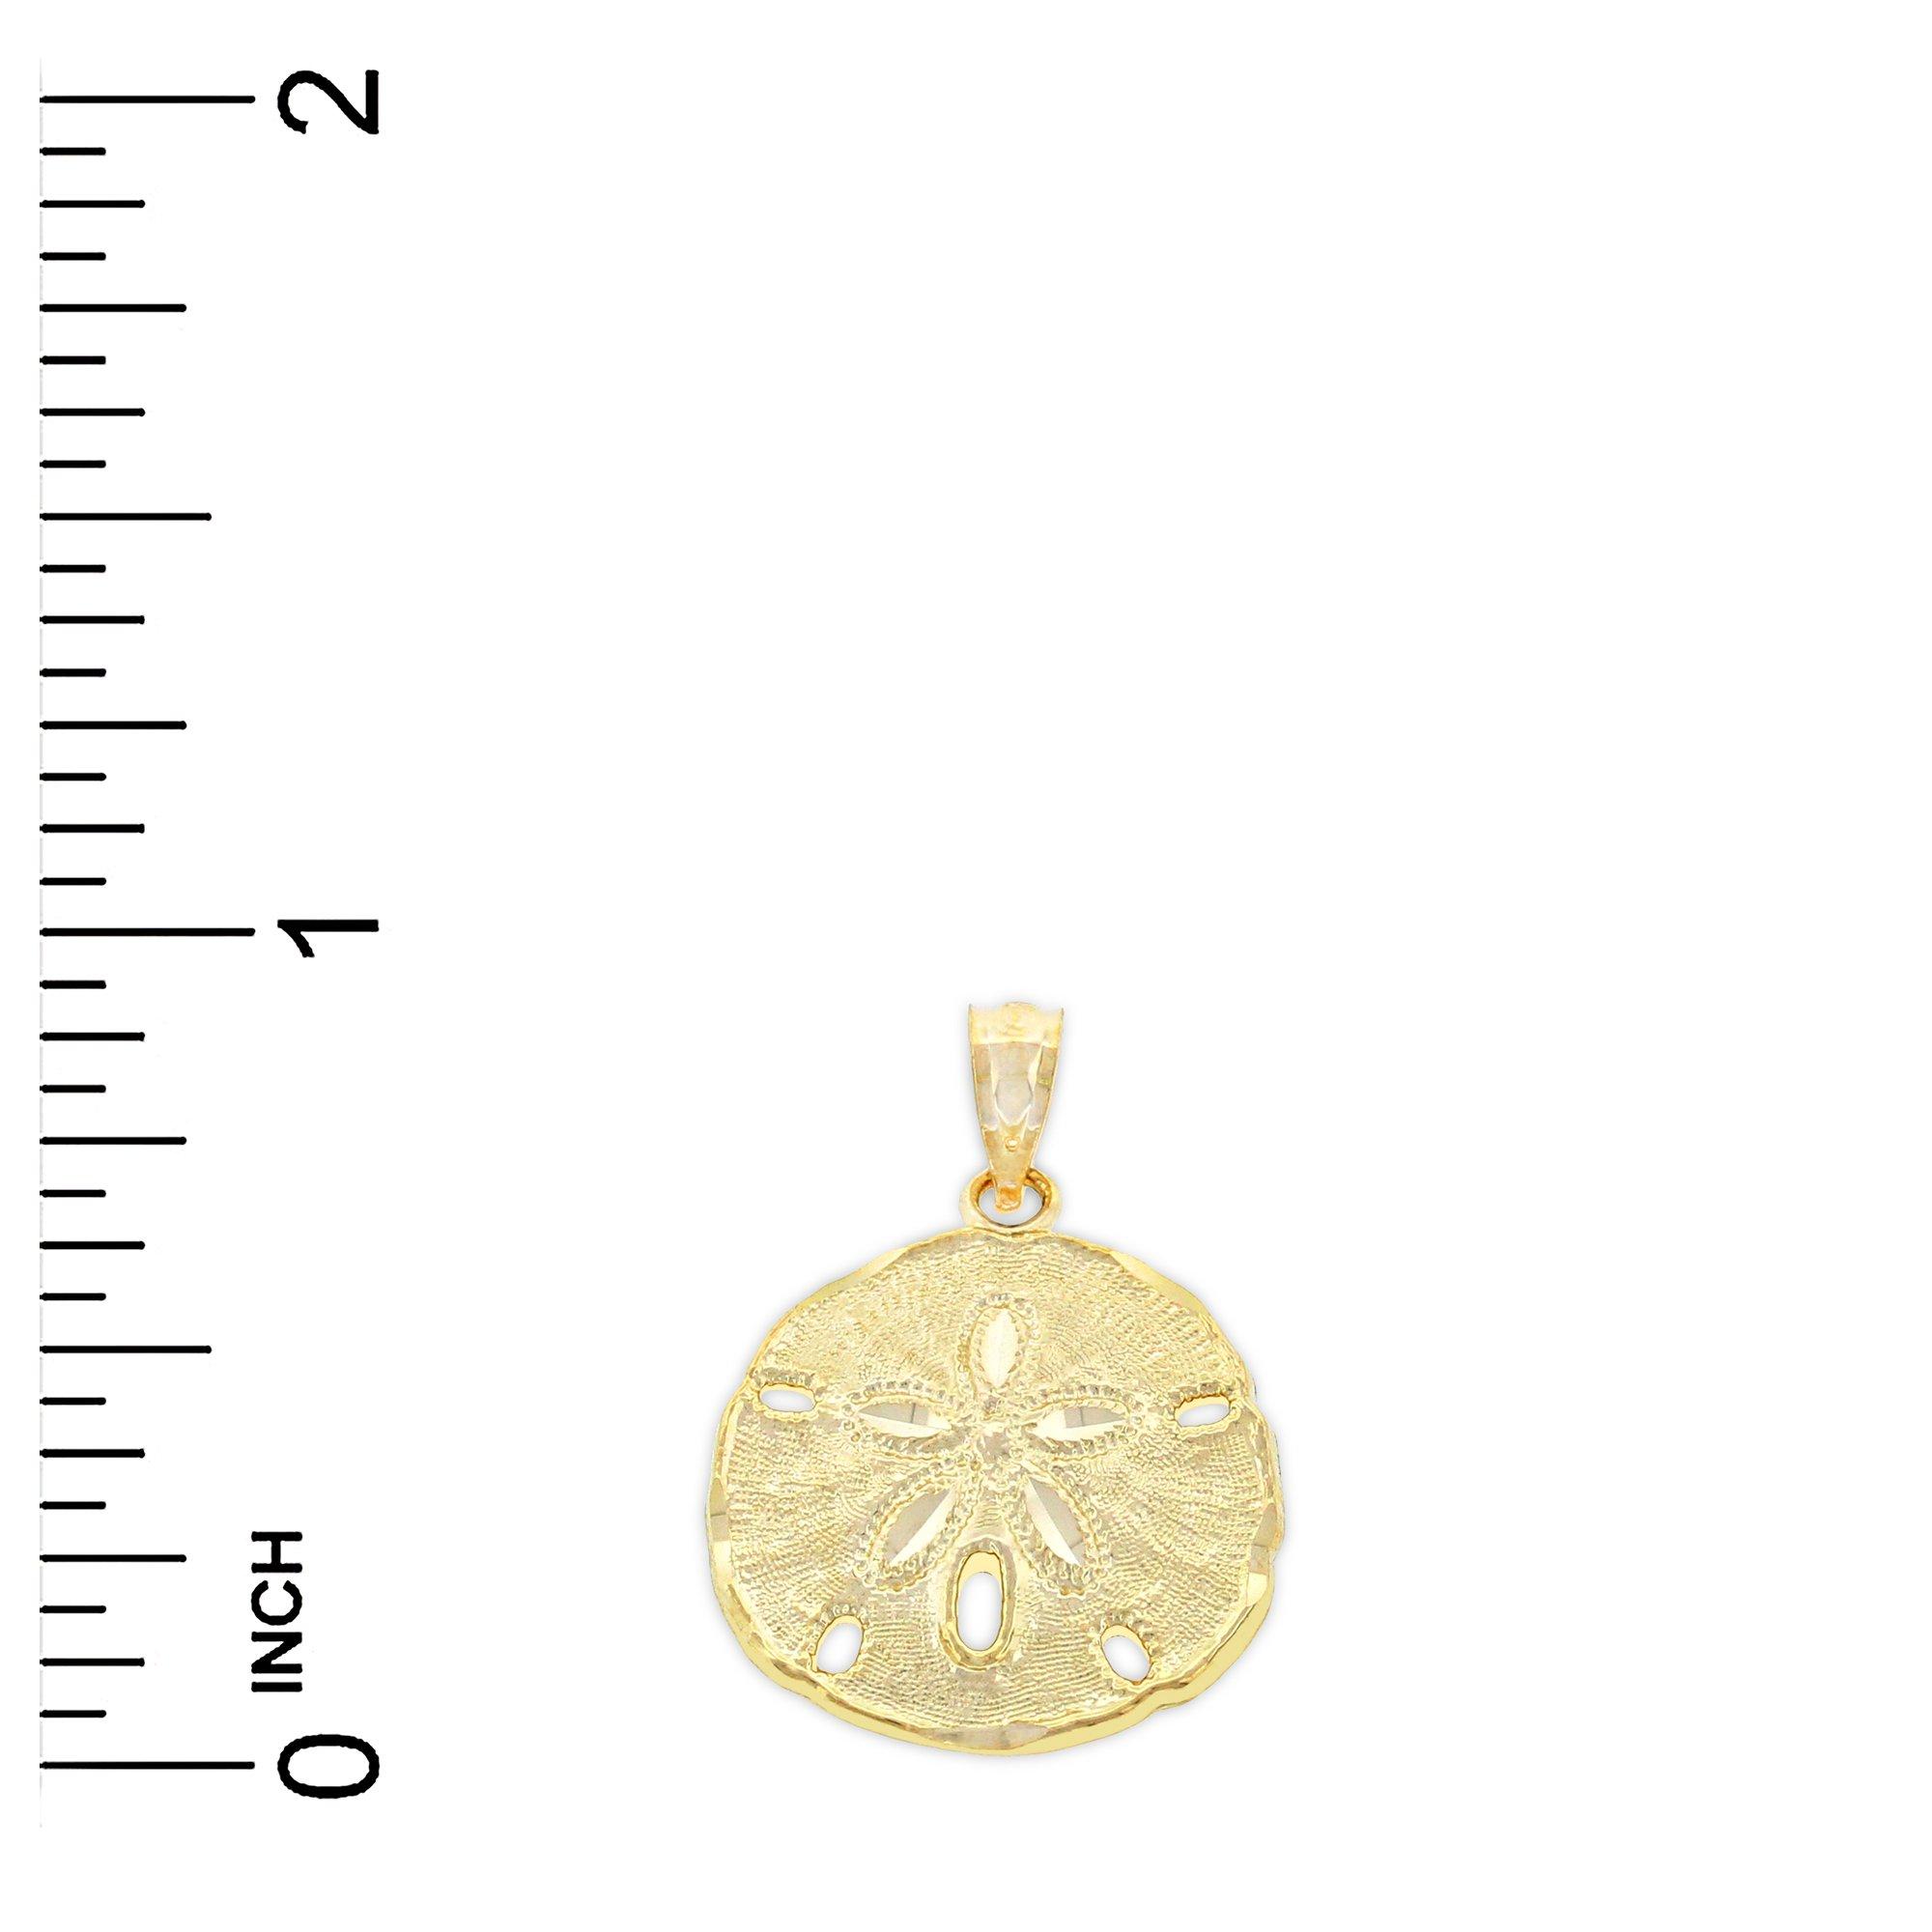 Charm America - Gold Sand Dollar Charm - 10 Karat Solid Gold by Charm America (Image #2)